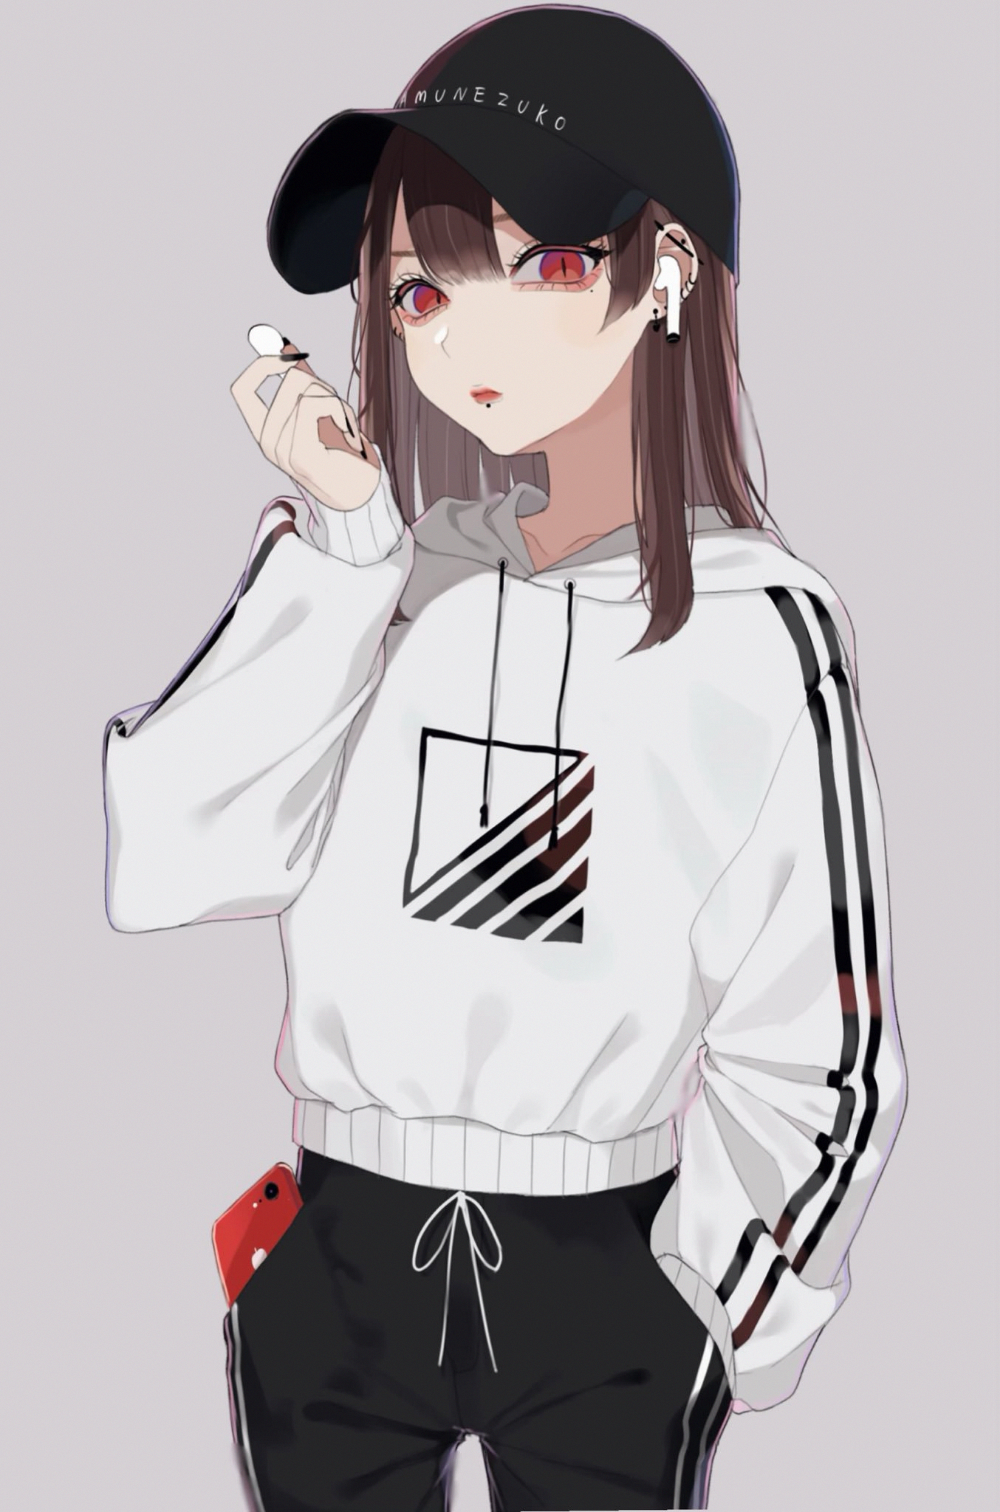 Kawaii Tomboy Cute Anime Girl - Anime Wallpaper HD